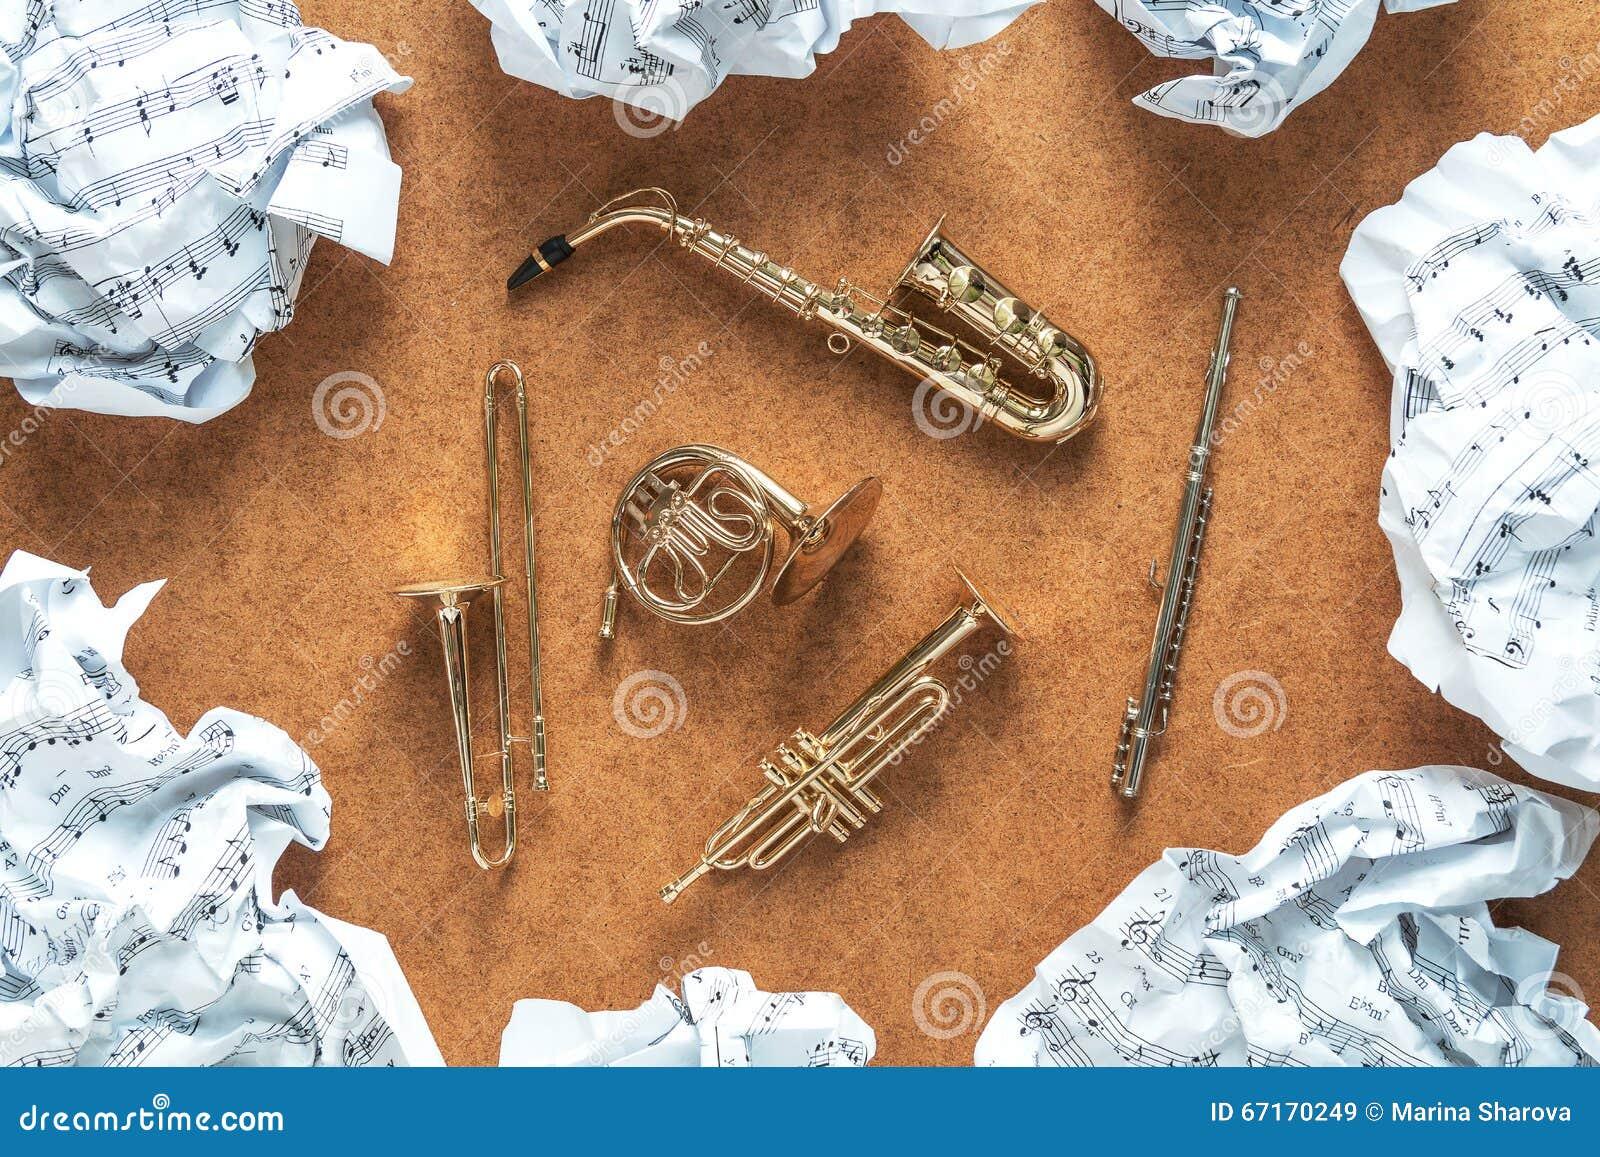 Комплект золотых аппаратур оркестра латунного ветра игрушки: саксофон, труба, французский рожок, тромбон нот иллюстрации электрич